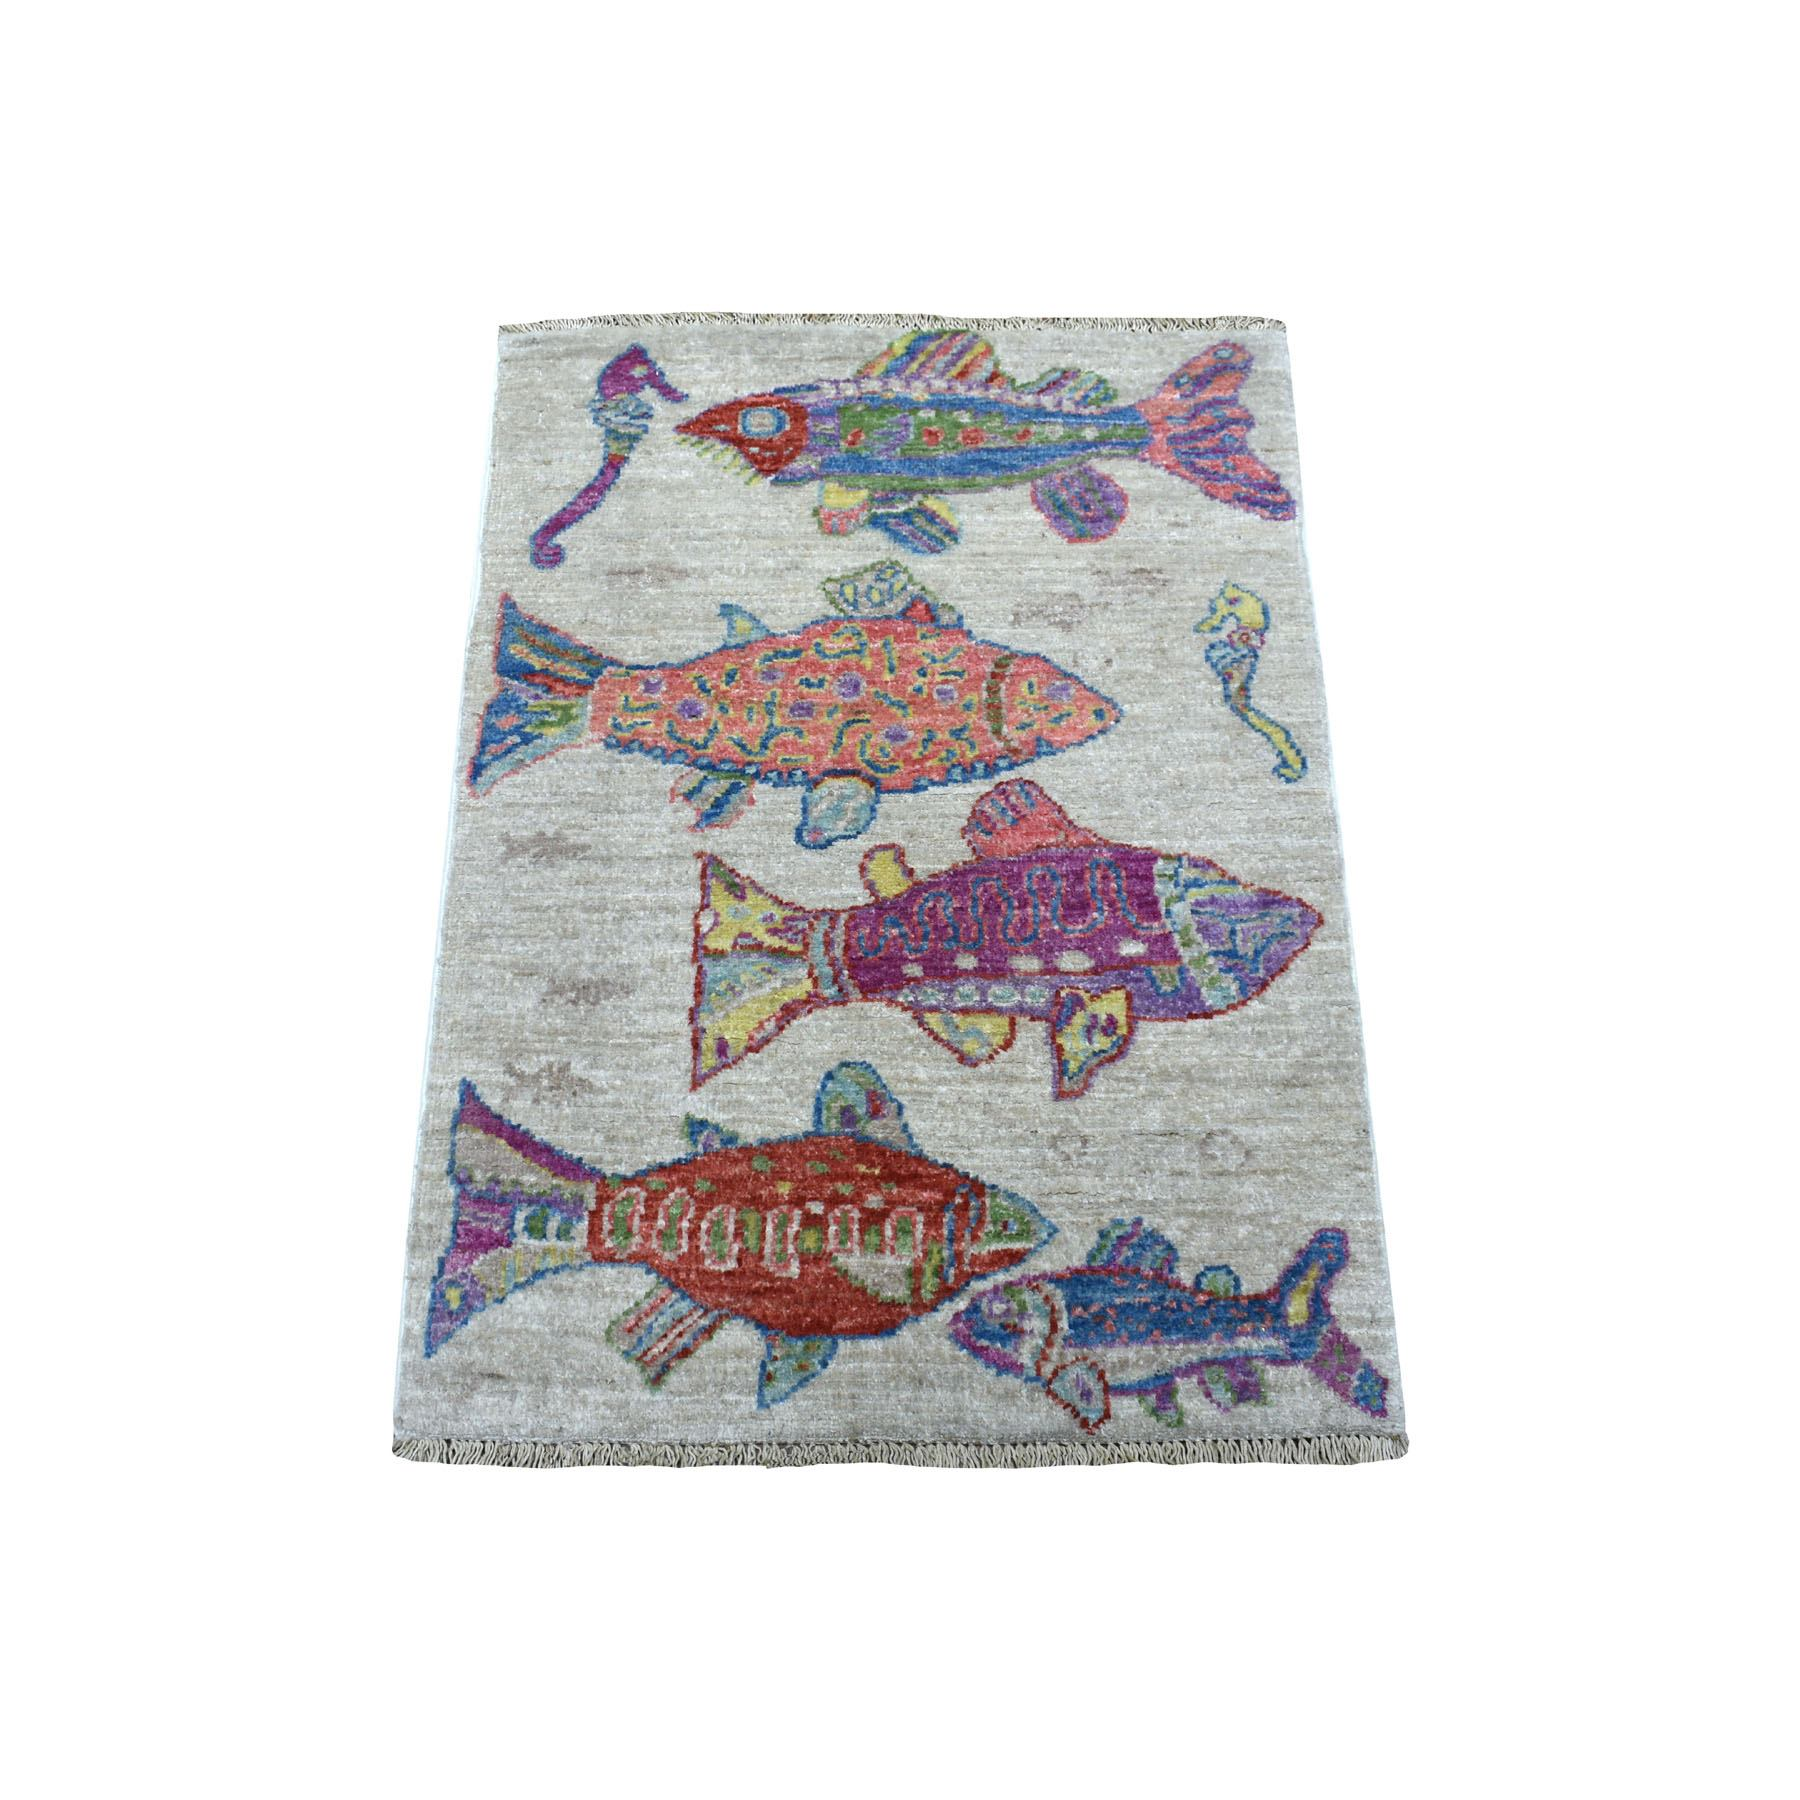 2'X3' Oceanic Fish Design Organic Wool Afghan Peshawar Hand Knotted Oriental Rug moaee099